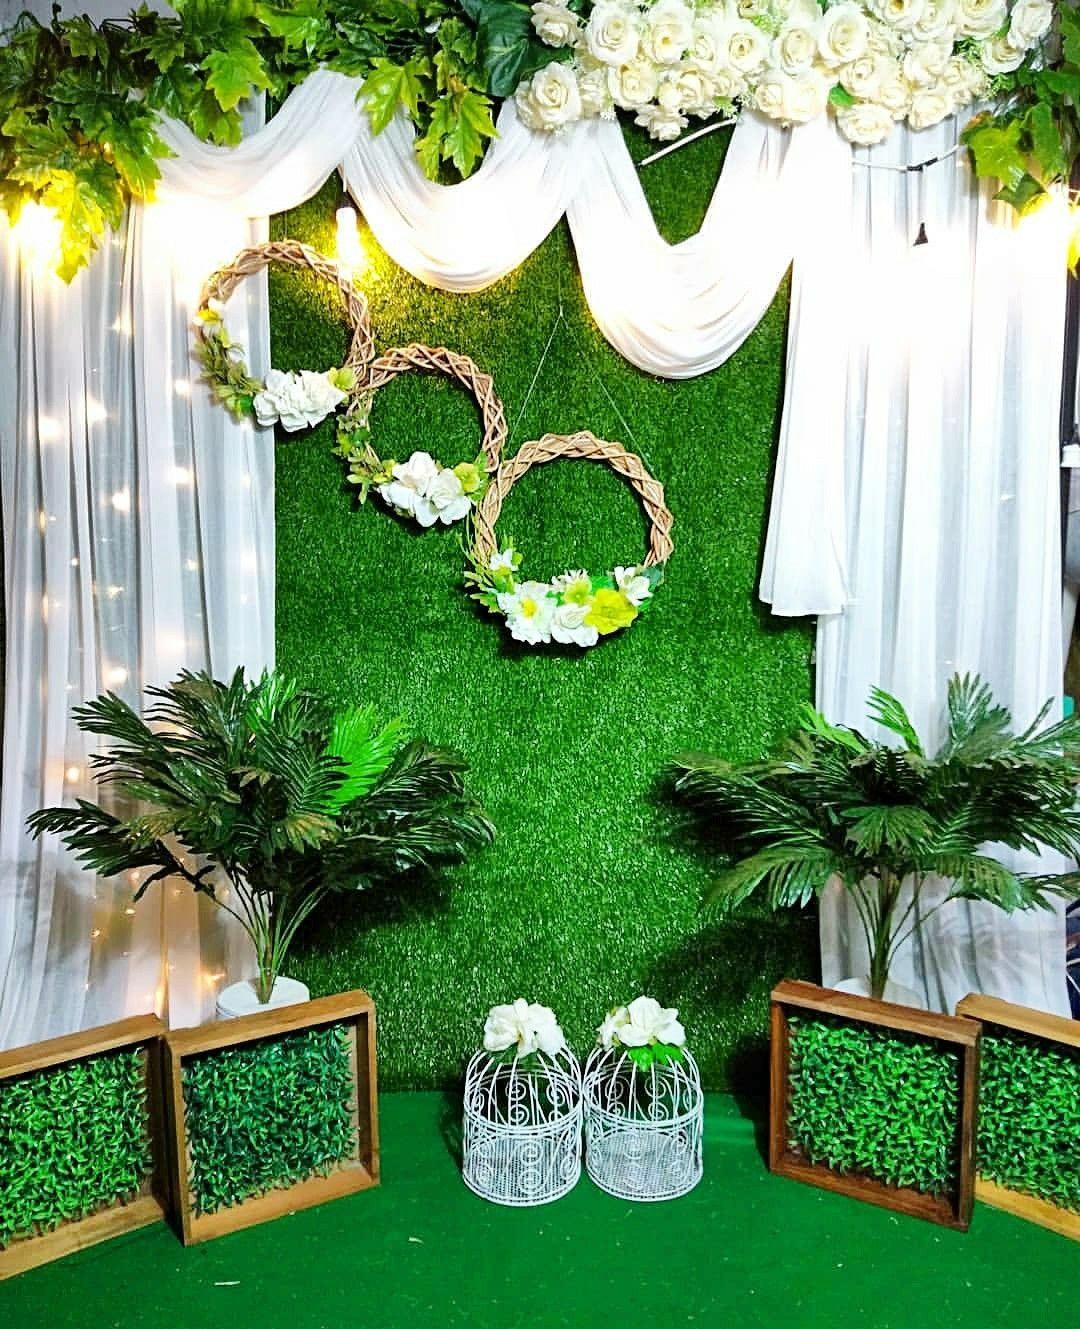 Backdrop Lamaran Surabaya | Wedding Background Decoration, Desi Wedding  Decor, Wedding Stage Decorations